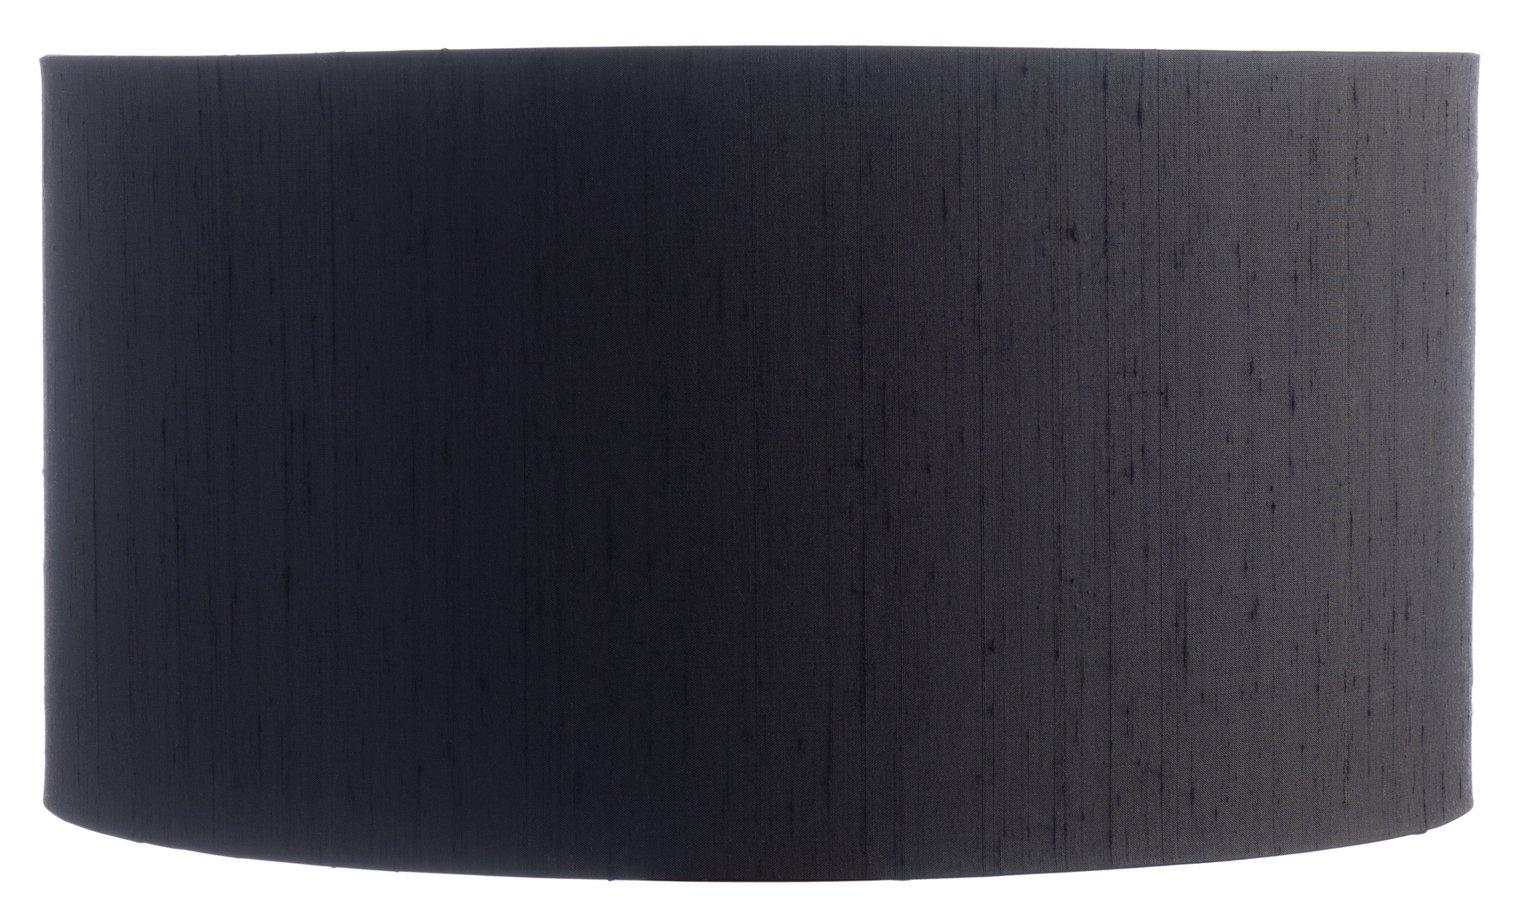 Habitat Drum Silk Shade - Black